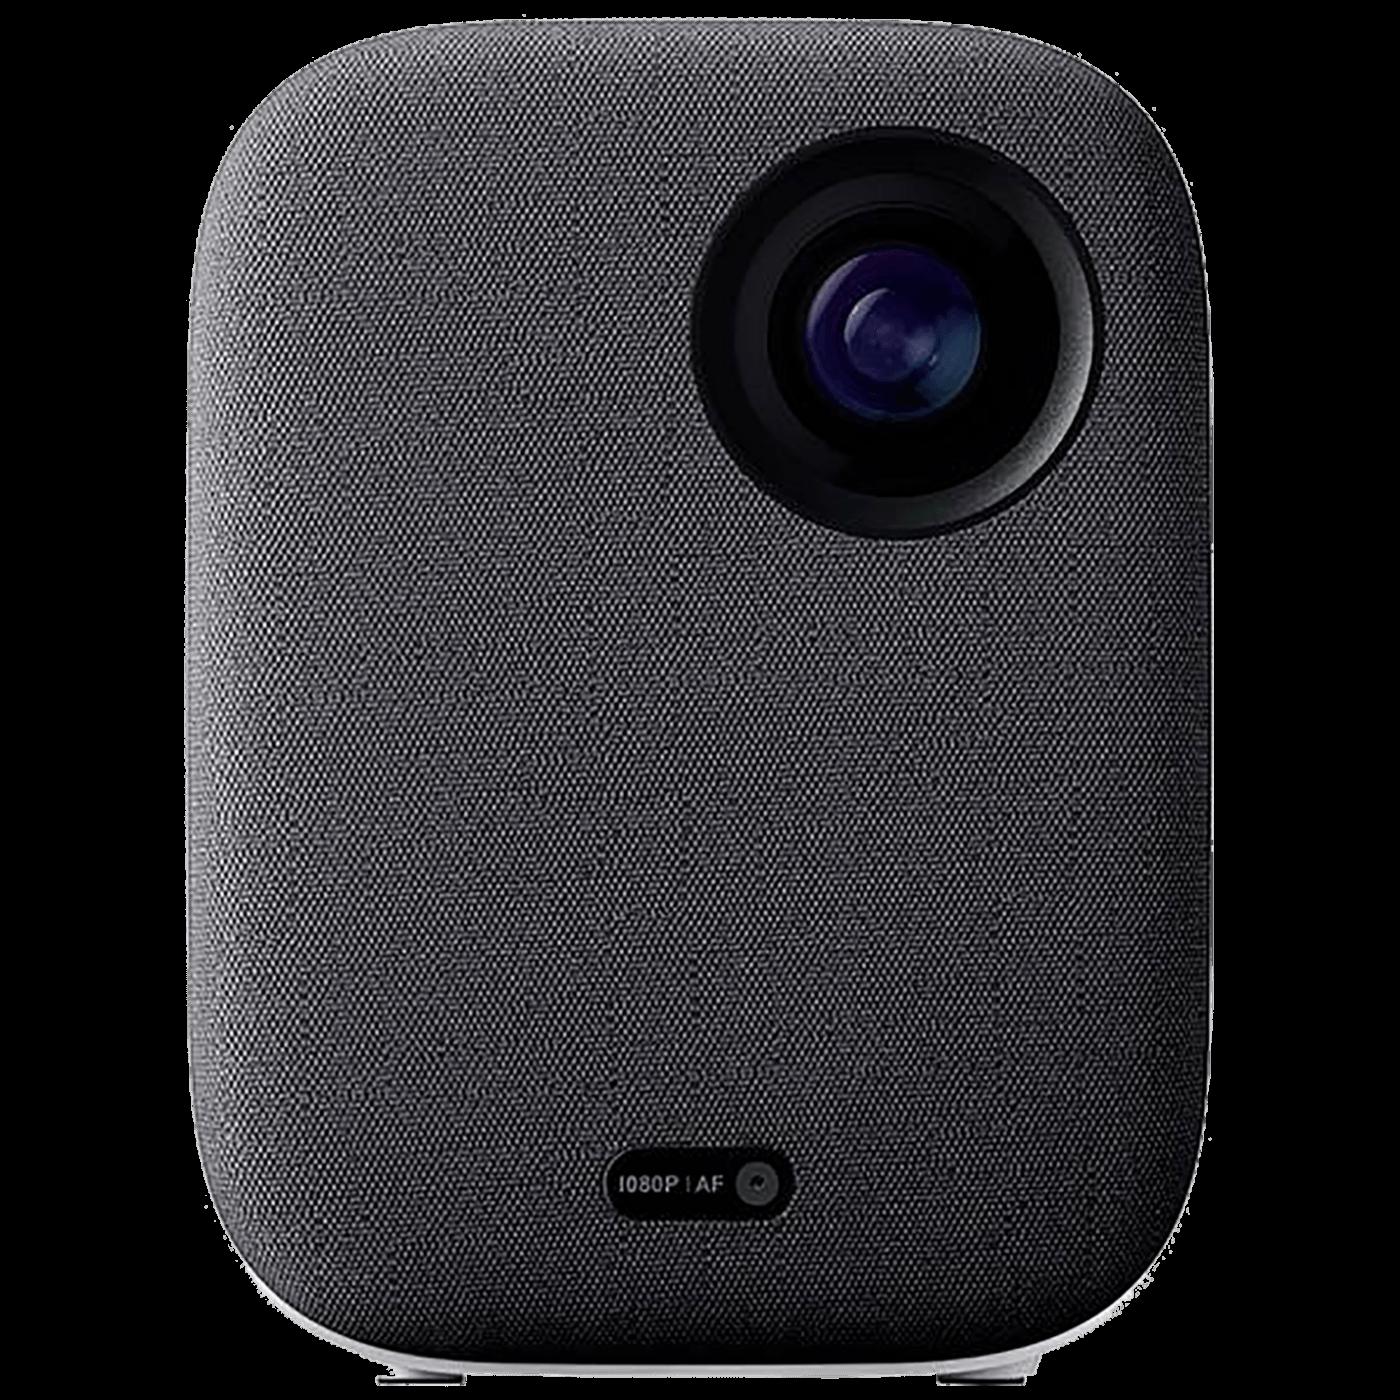 Pametni projektor, Full HD, Android TV, WiFi 2.4 / 5 GHz